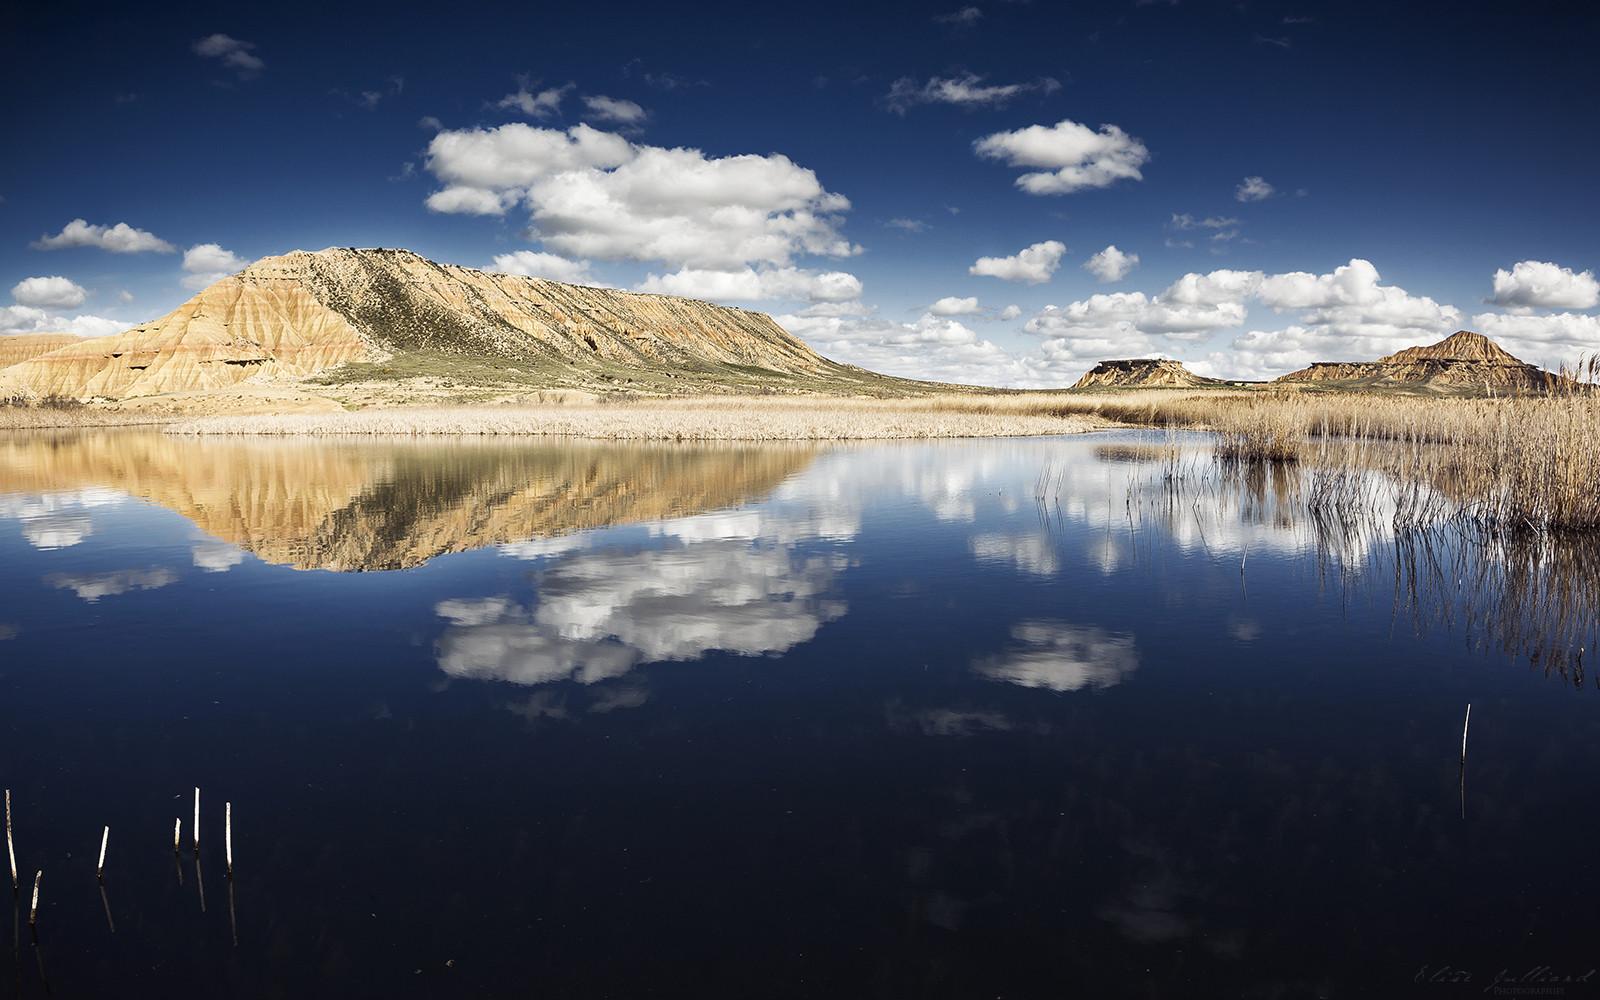 bardenas-reales-de-navarra-paysage-landscape-photographe-elise-julliard-espagne-desert-lac-game-of-thrones-tudela-navarre-arguedas-voyage